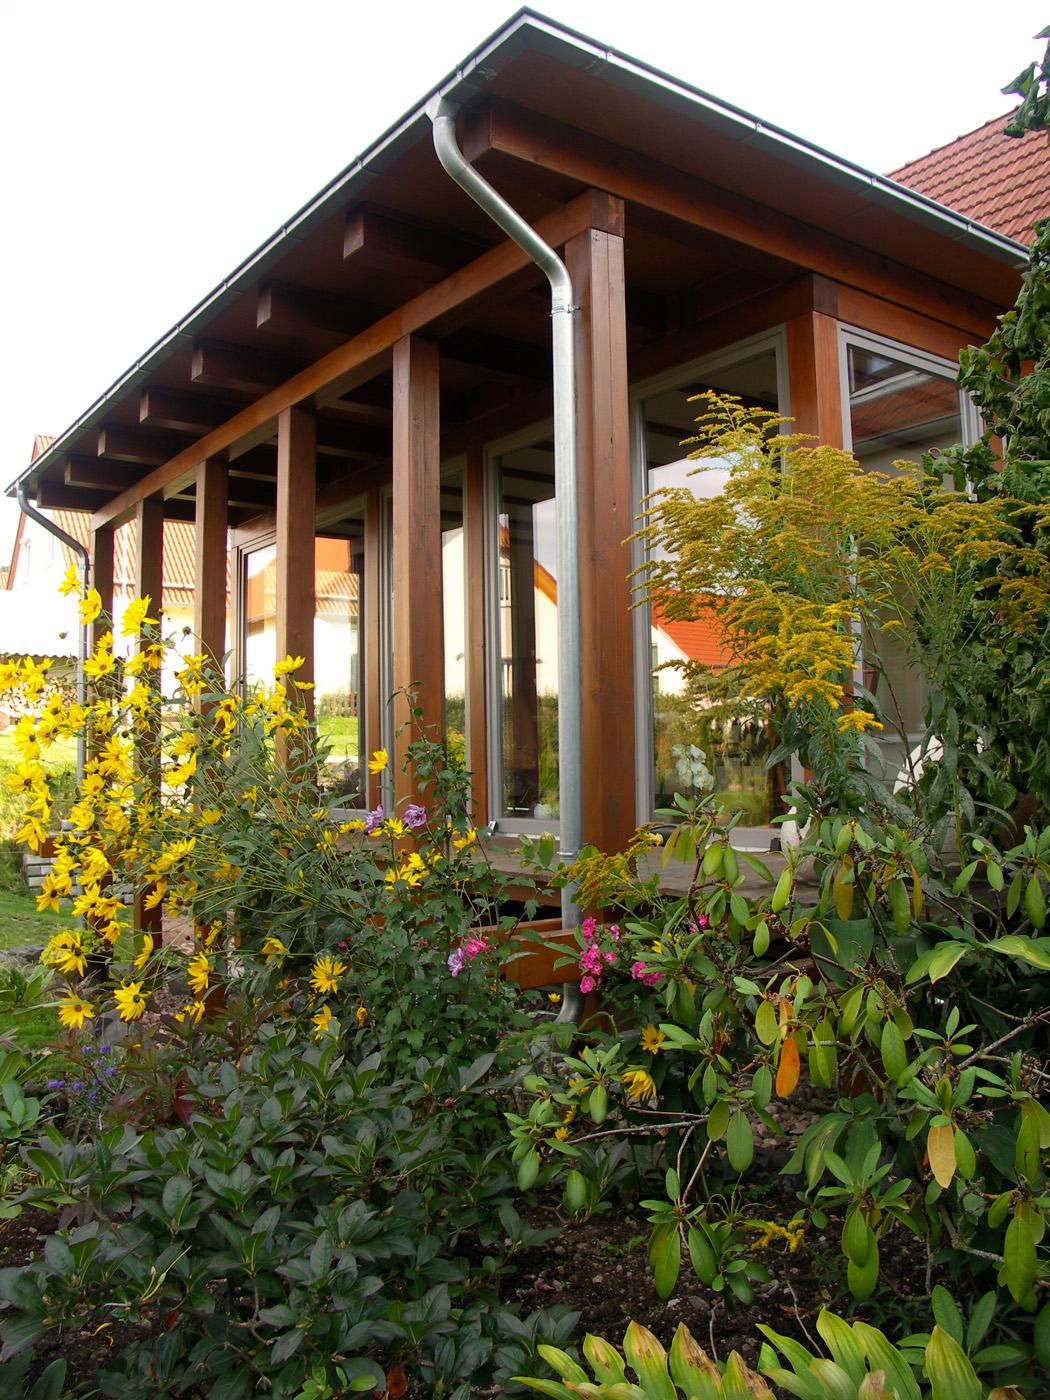 Wintergarten Kohlmann in Friedrichroda